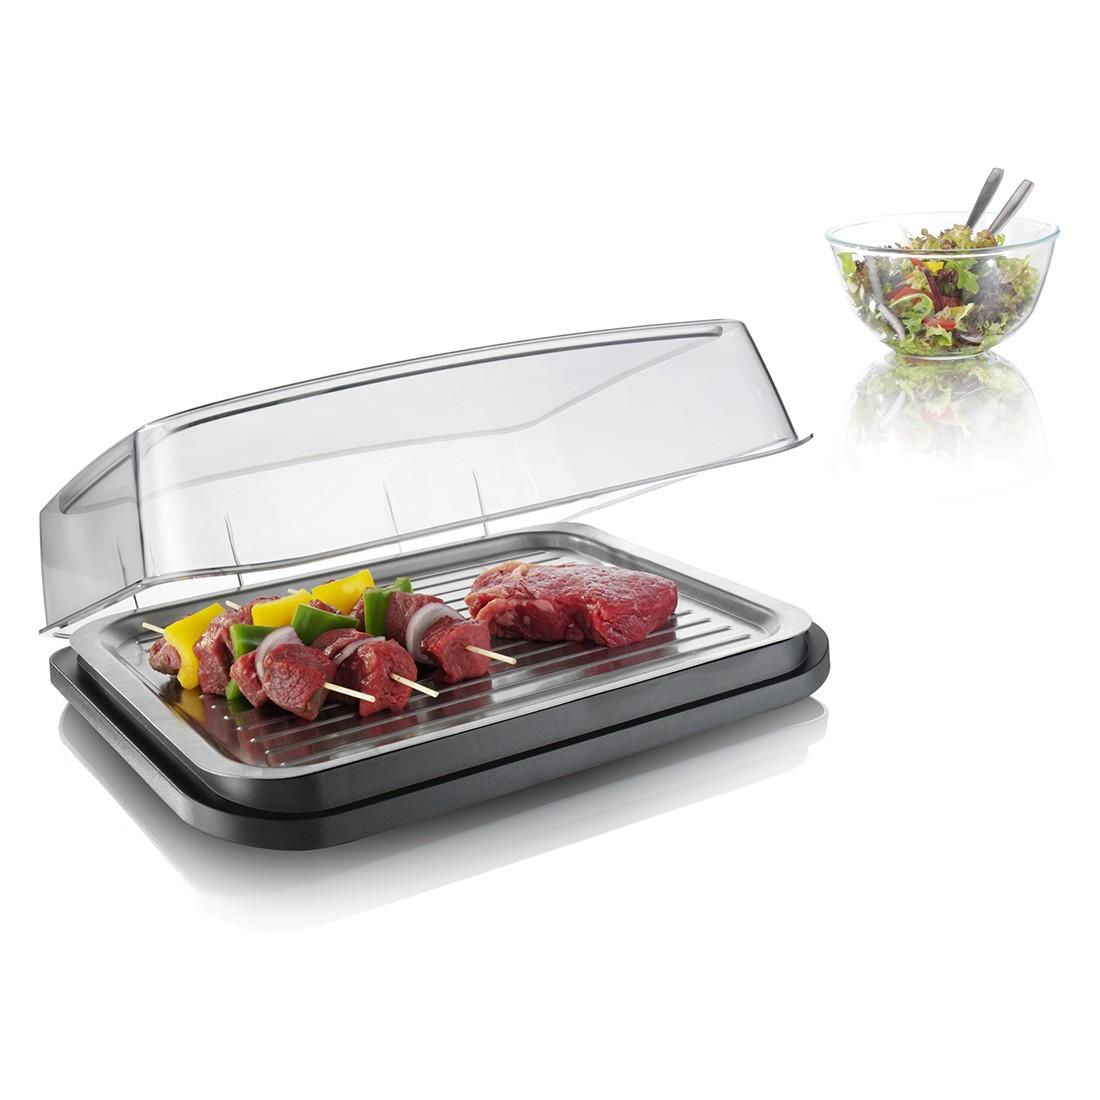 Kühlplatte / BBQ Kühler, Vacu Vin günstig bestellen